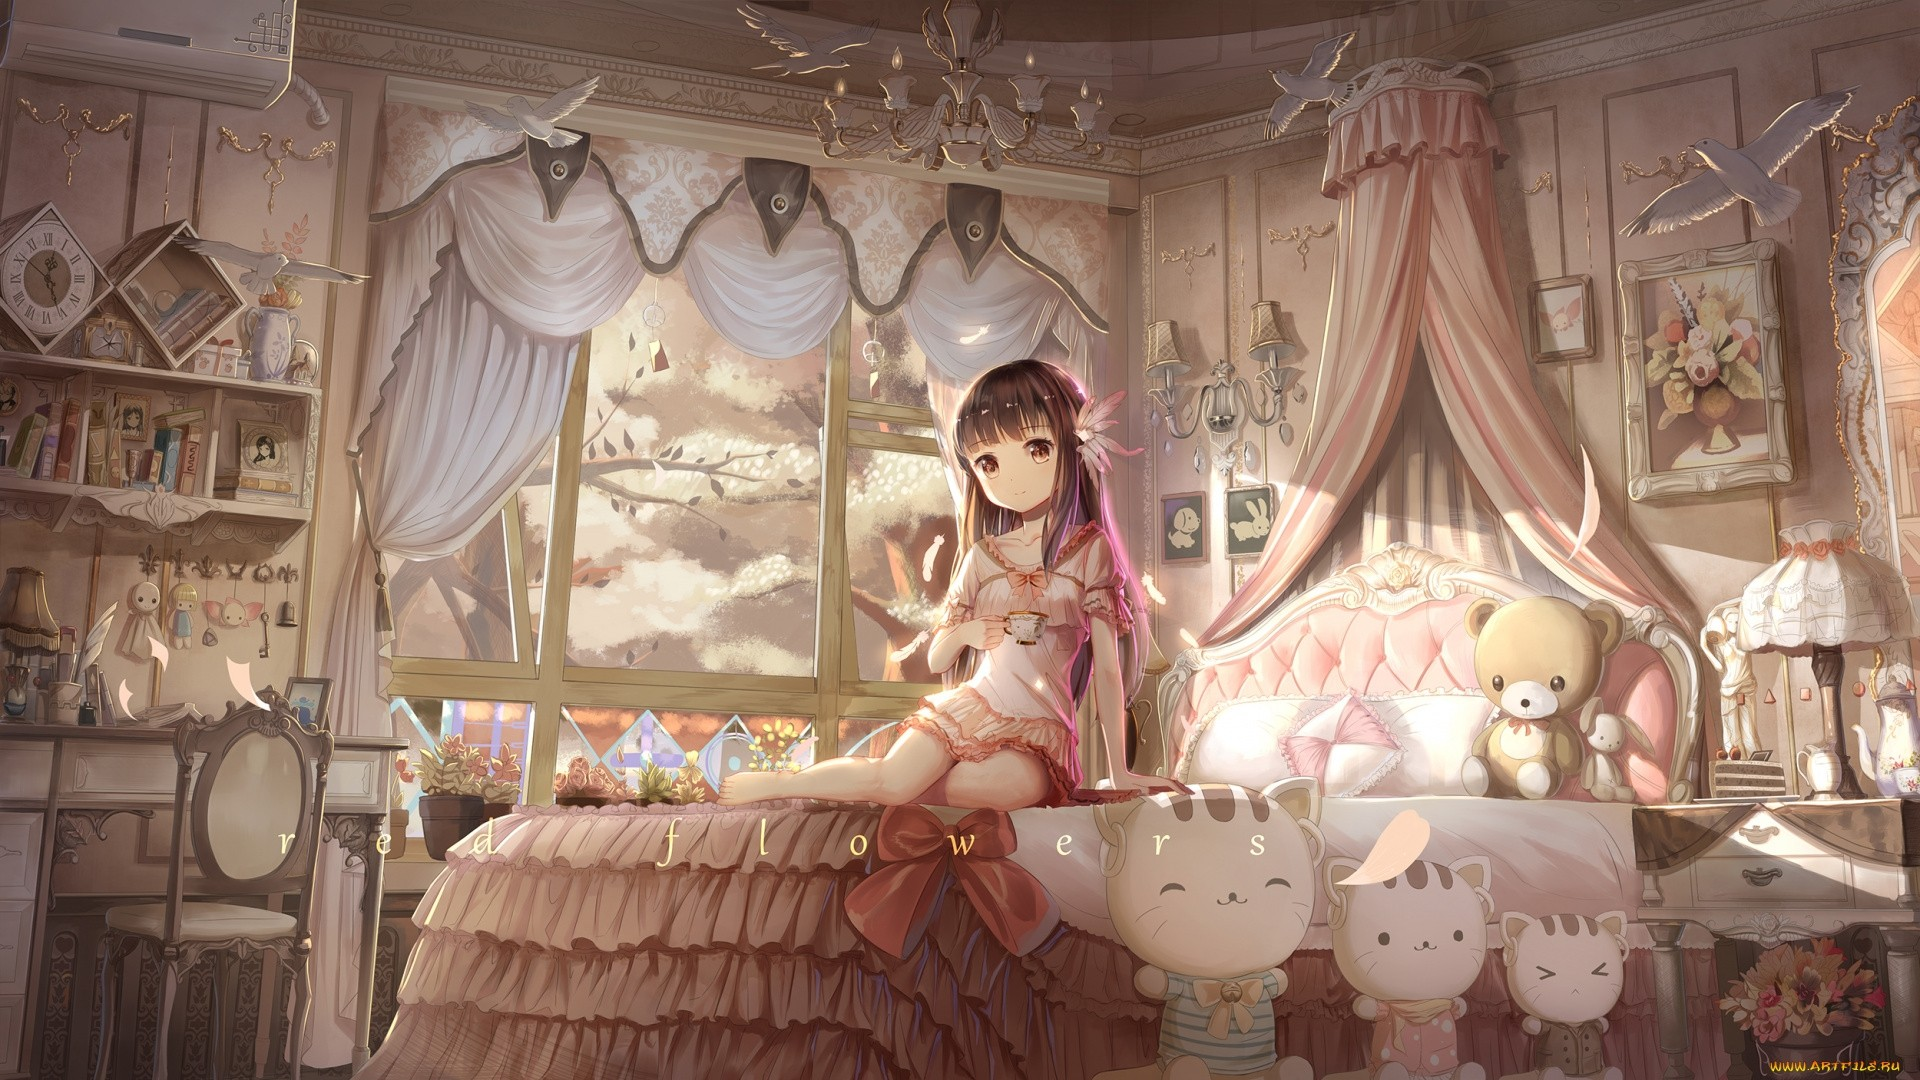 Anime Bedroom HD Wallpaper